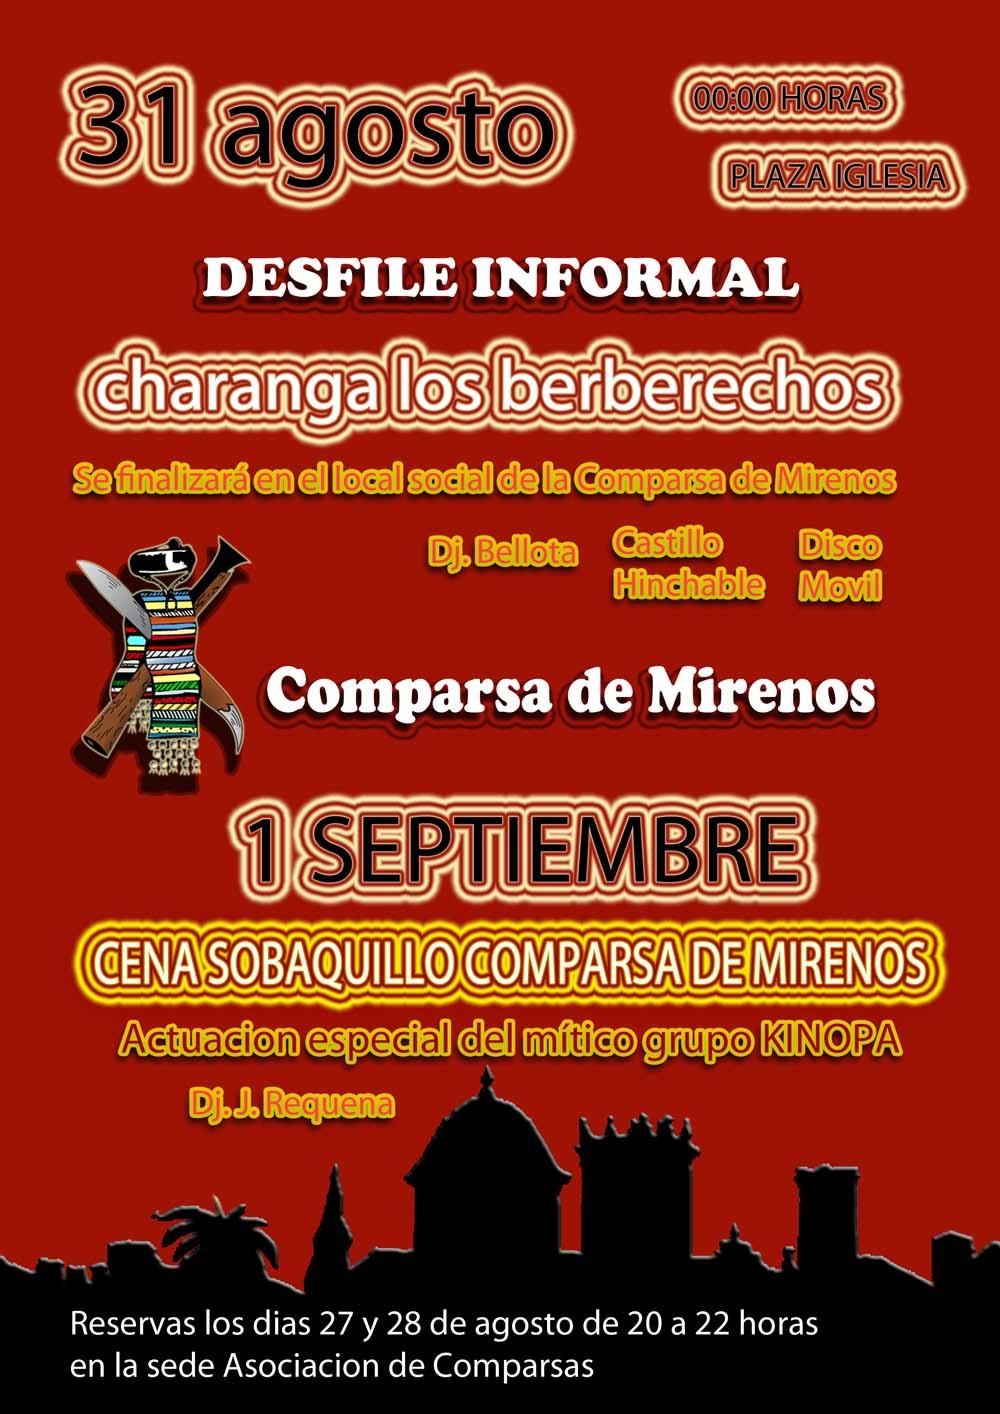 fiesta 31-08-2012